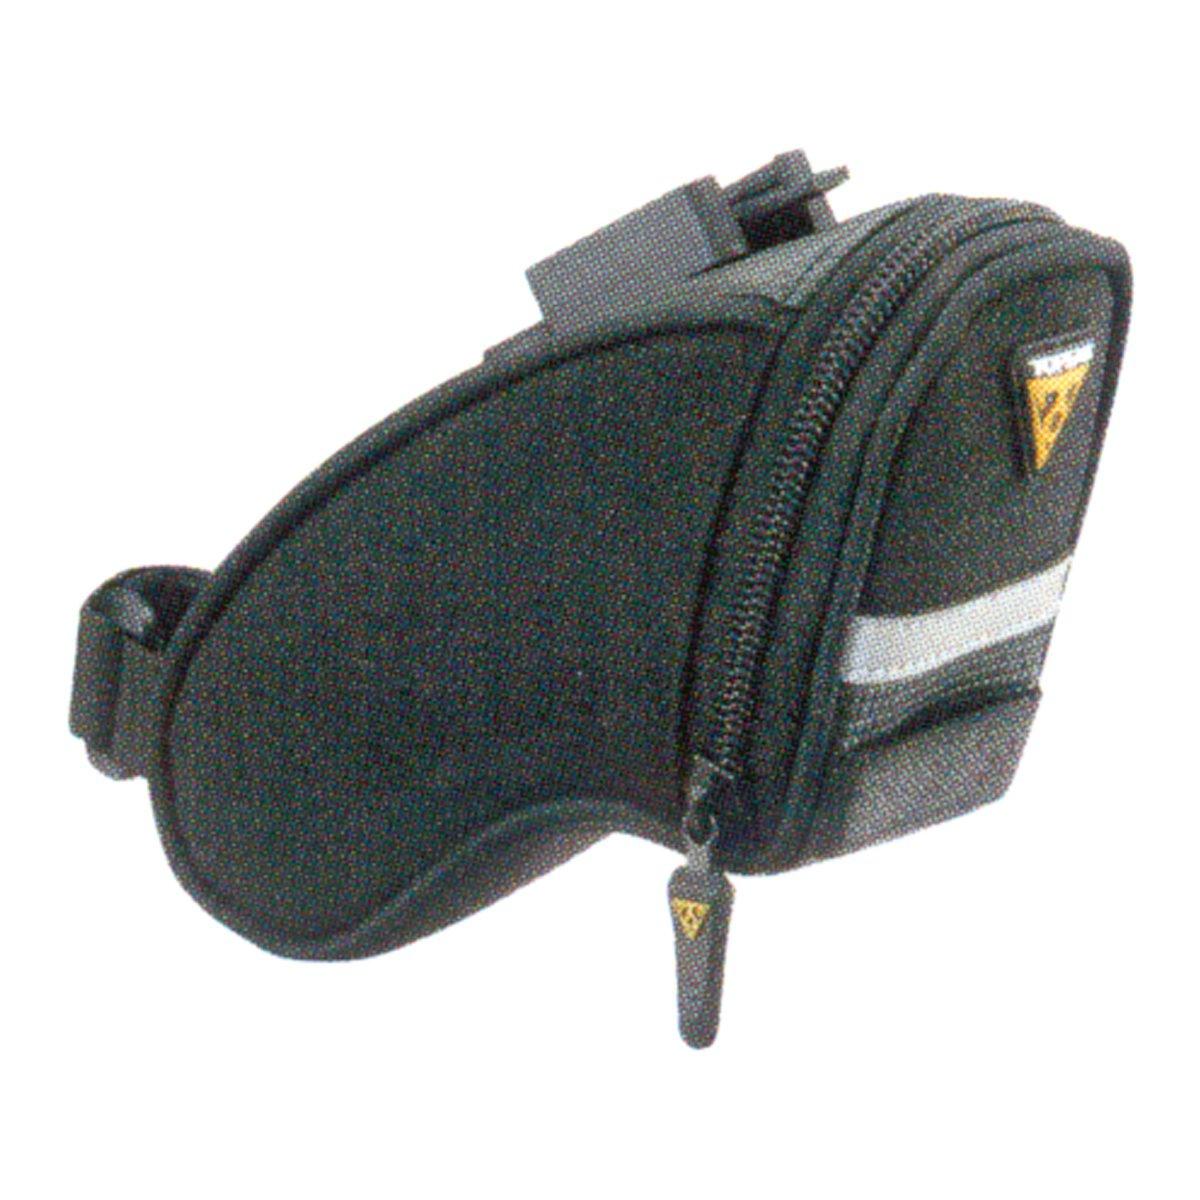 Topeak Aero Wedge Packs (Size: micro) seat pack